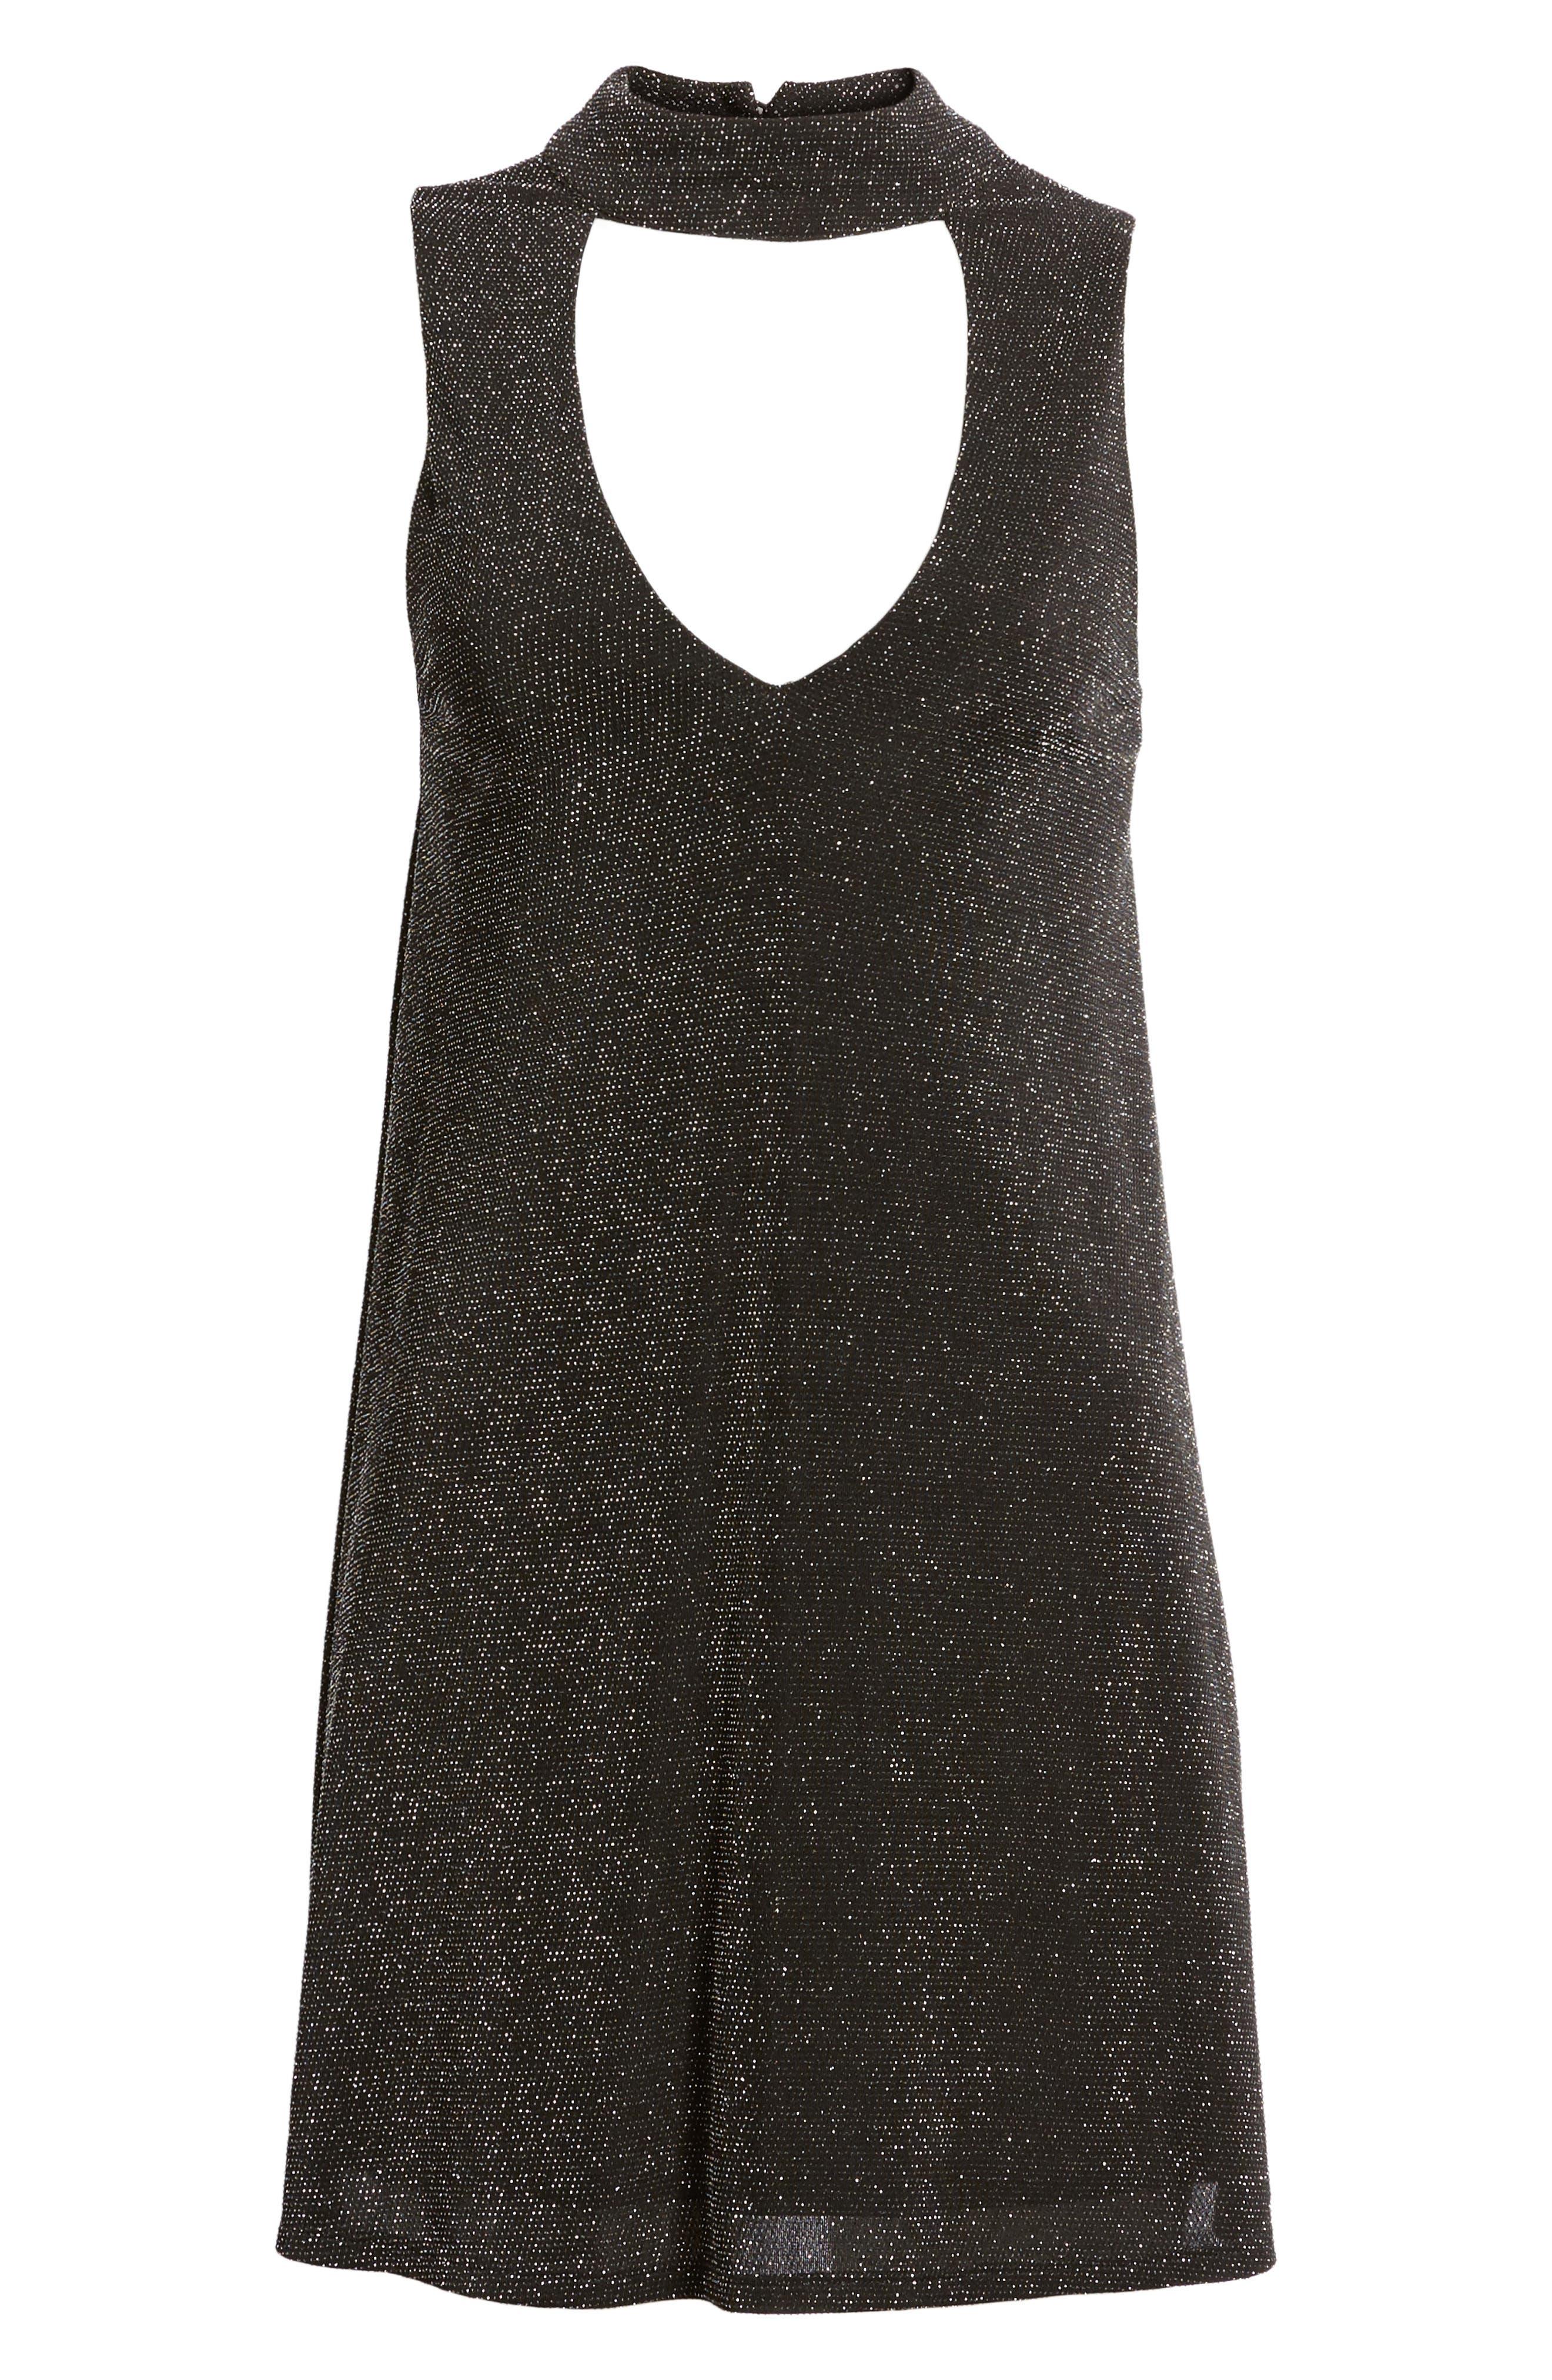 Friday Choker Dress,                             Alternate thumbnail 6, color,                             001